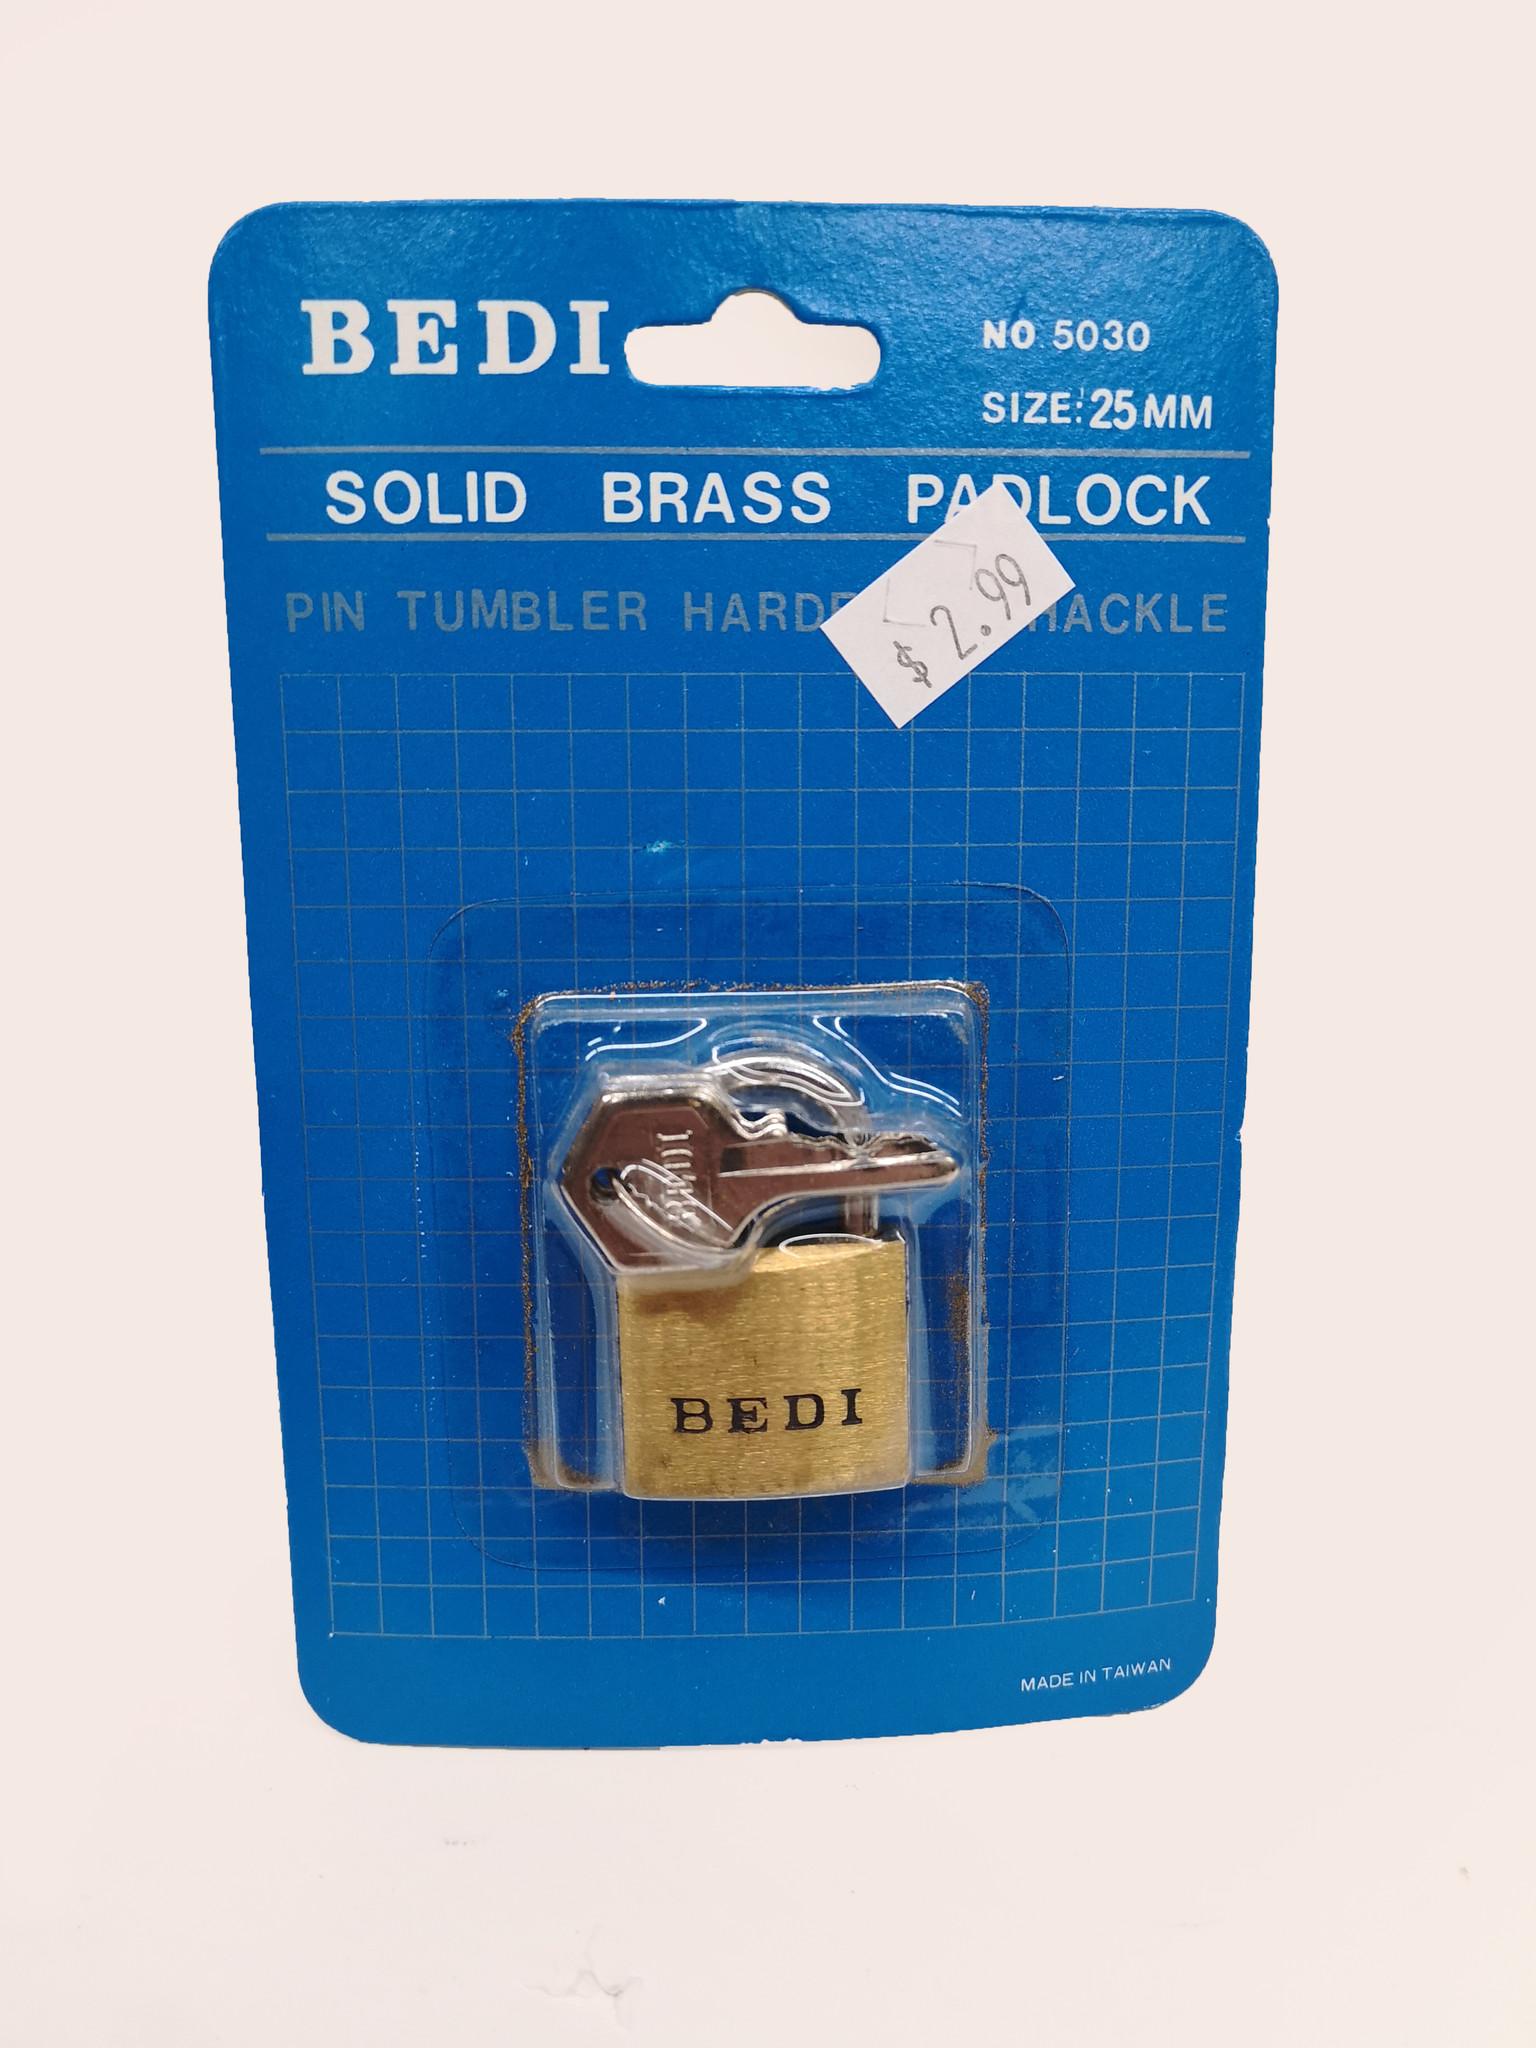 Bedi Bedi Solid Brass Padlock 25mm